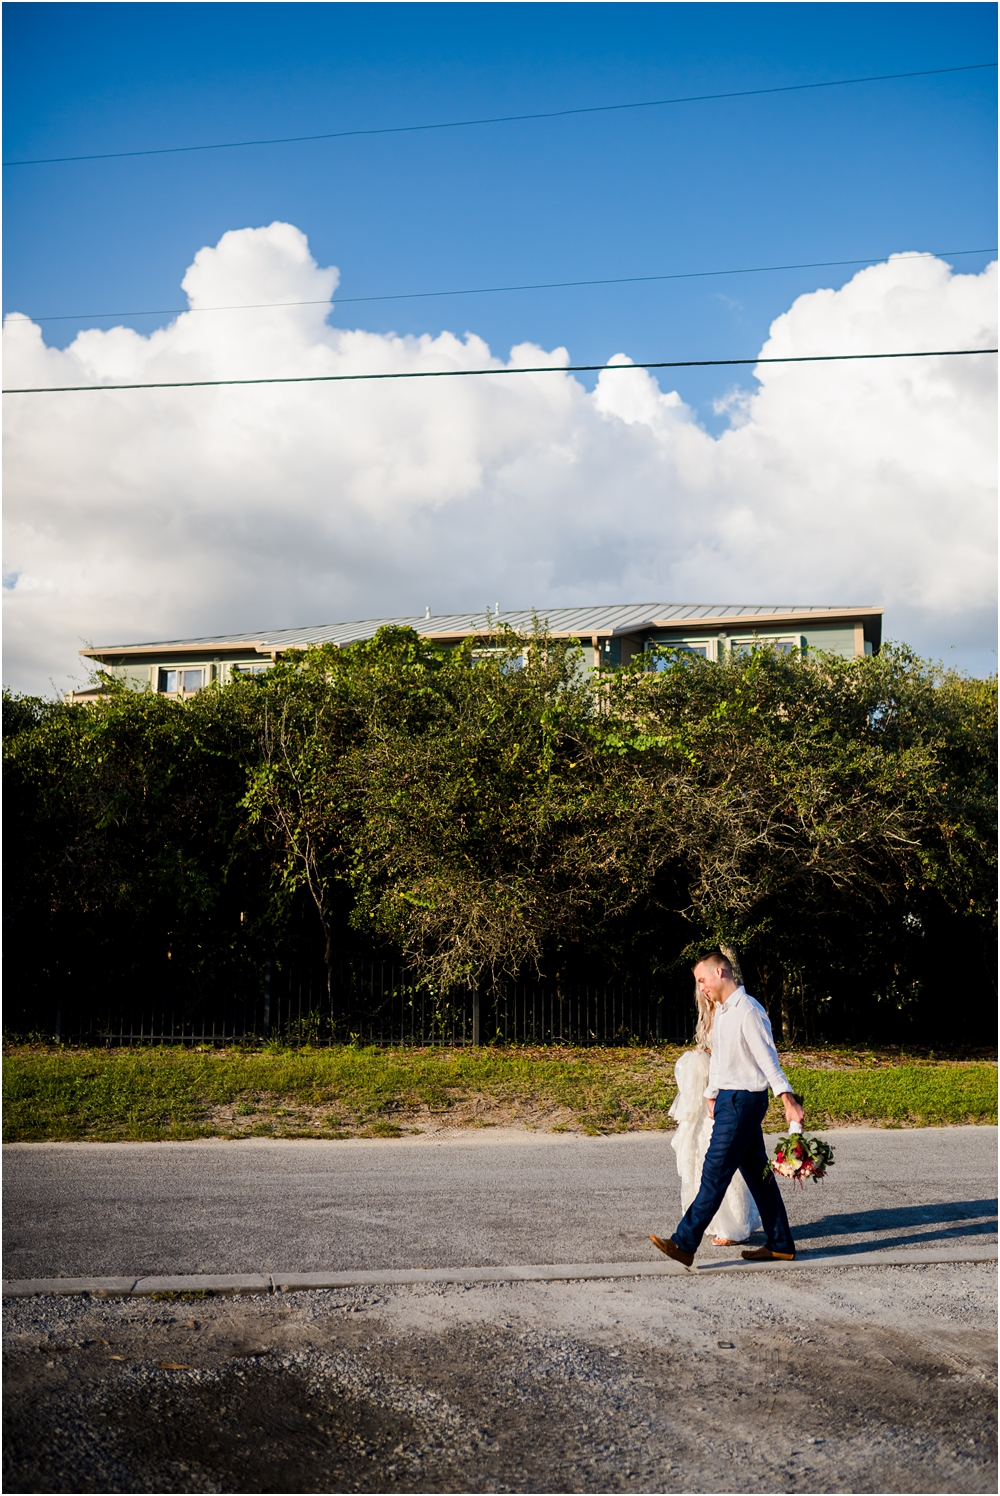 mcglothlin-wedding-kiersten-stevenson-photography-30a-panama-city-beach-dothan-tallahassee-(71-of-145).jpg